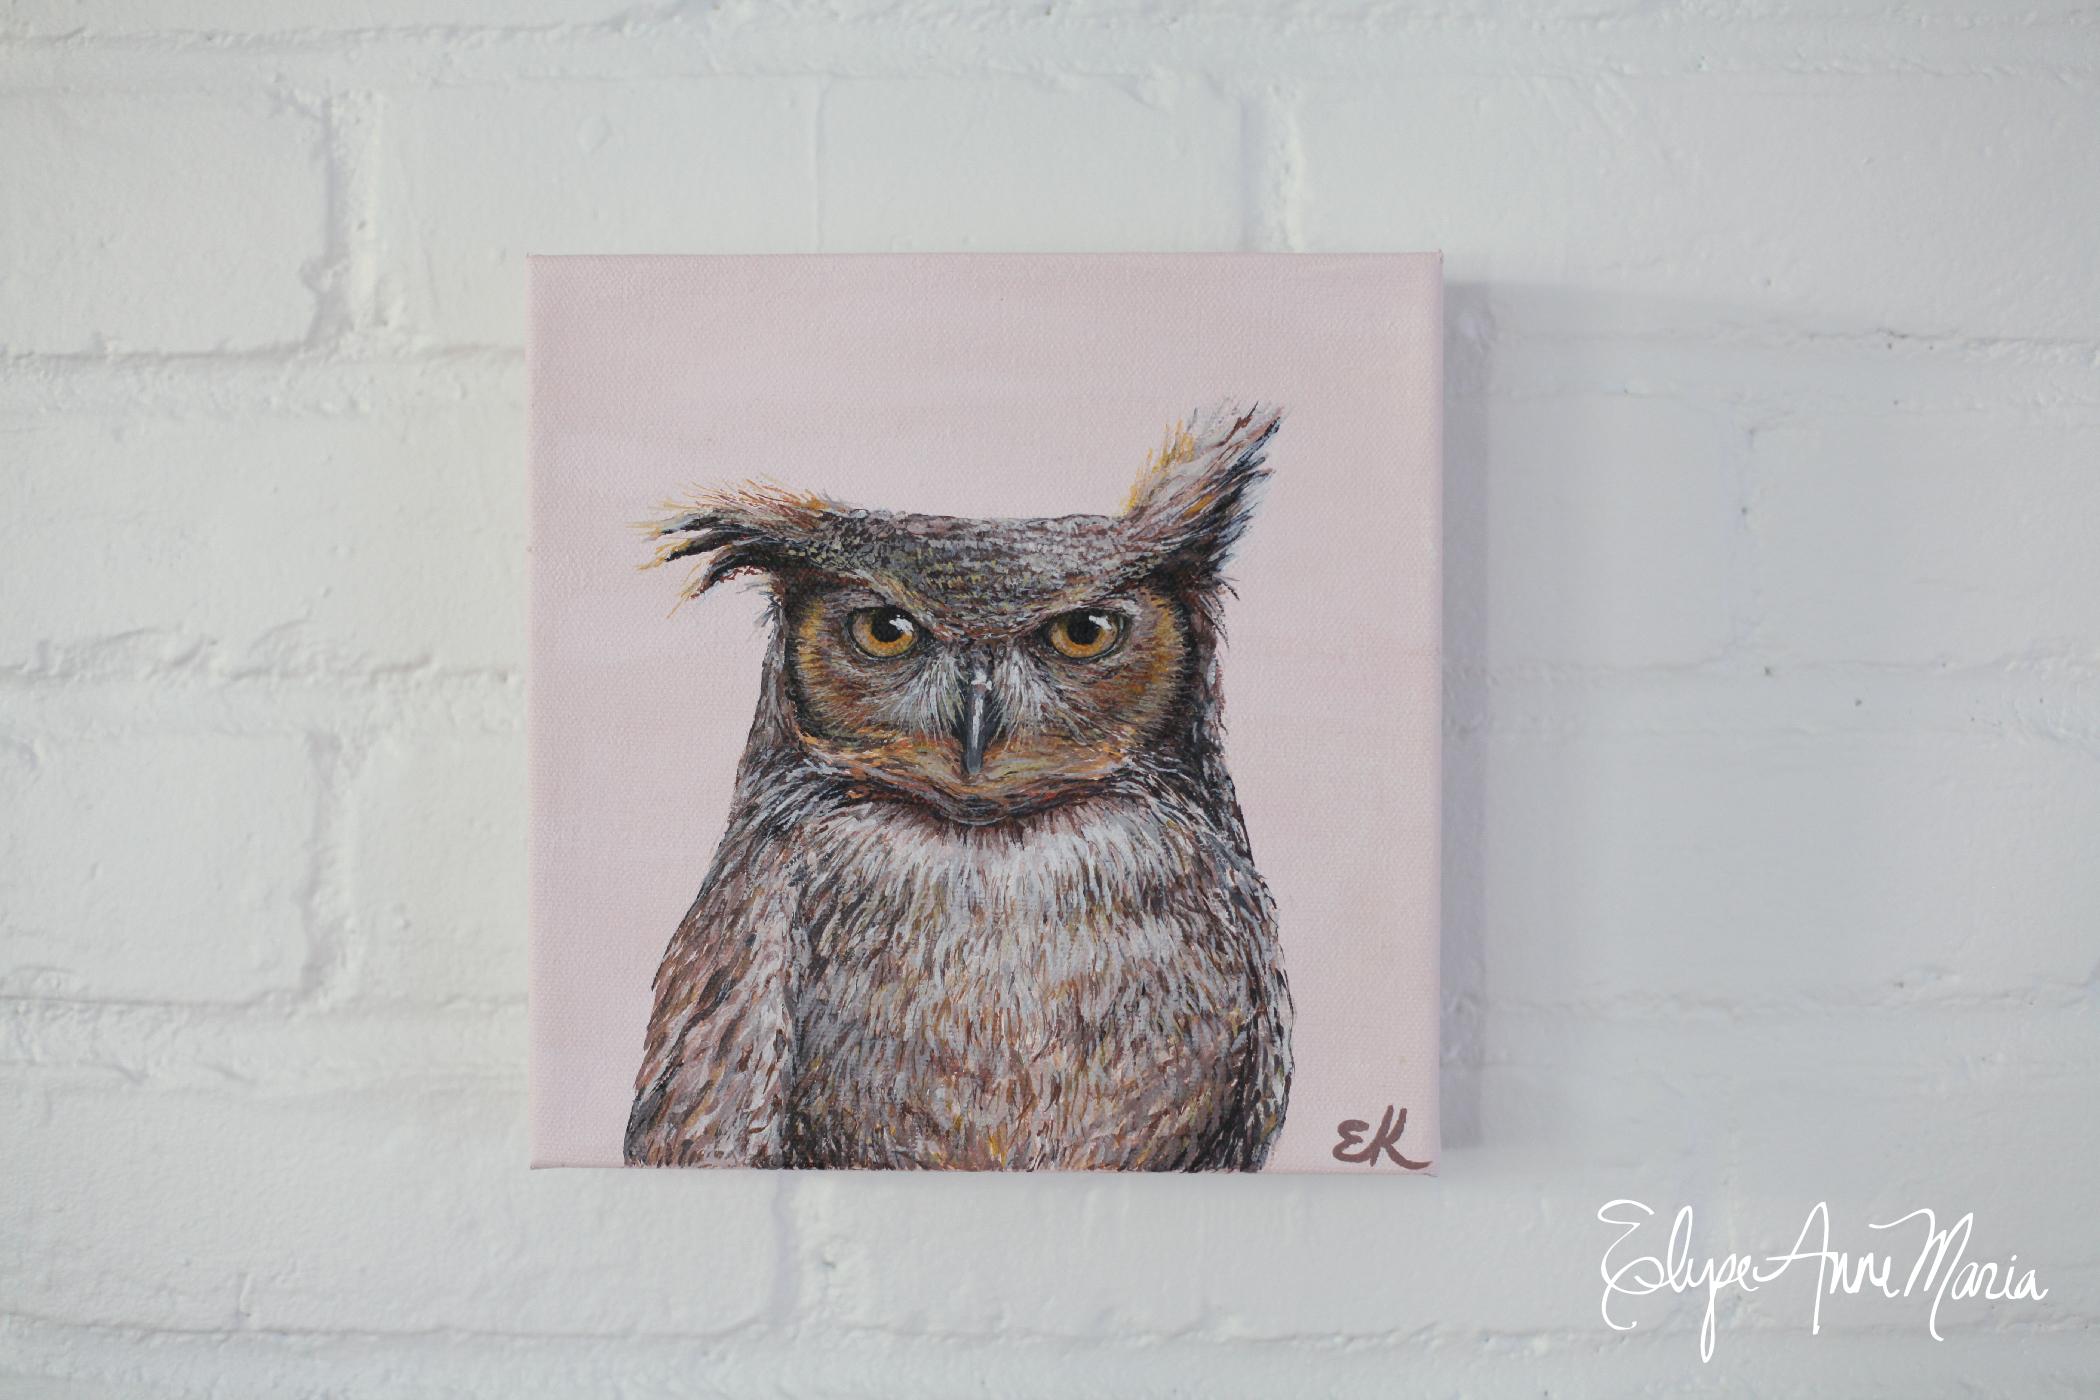 Owl8x8